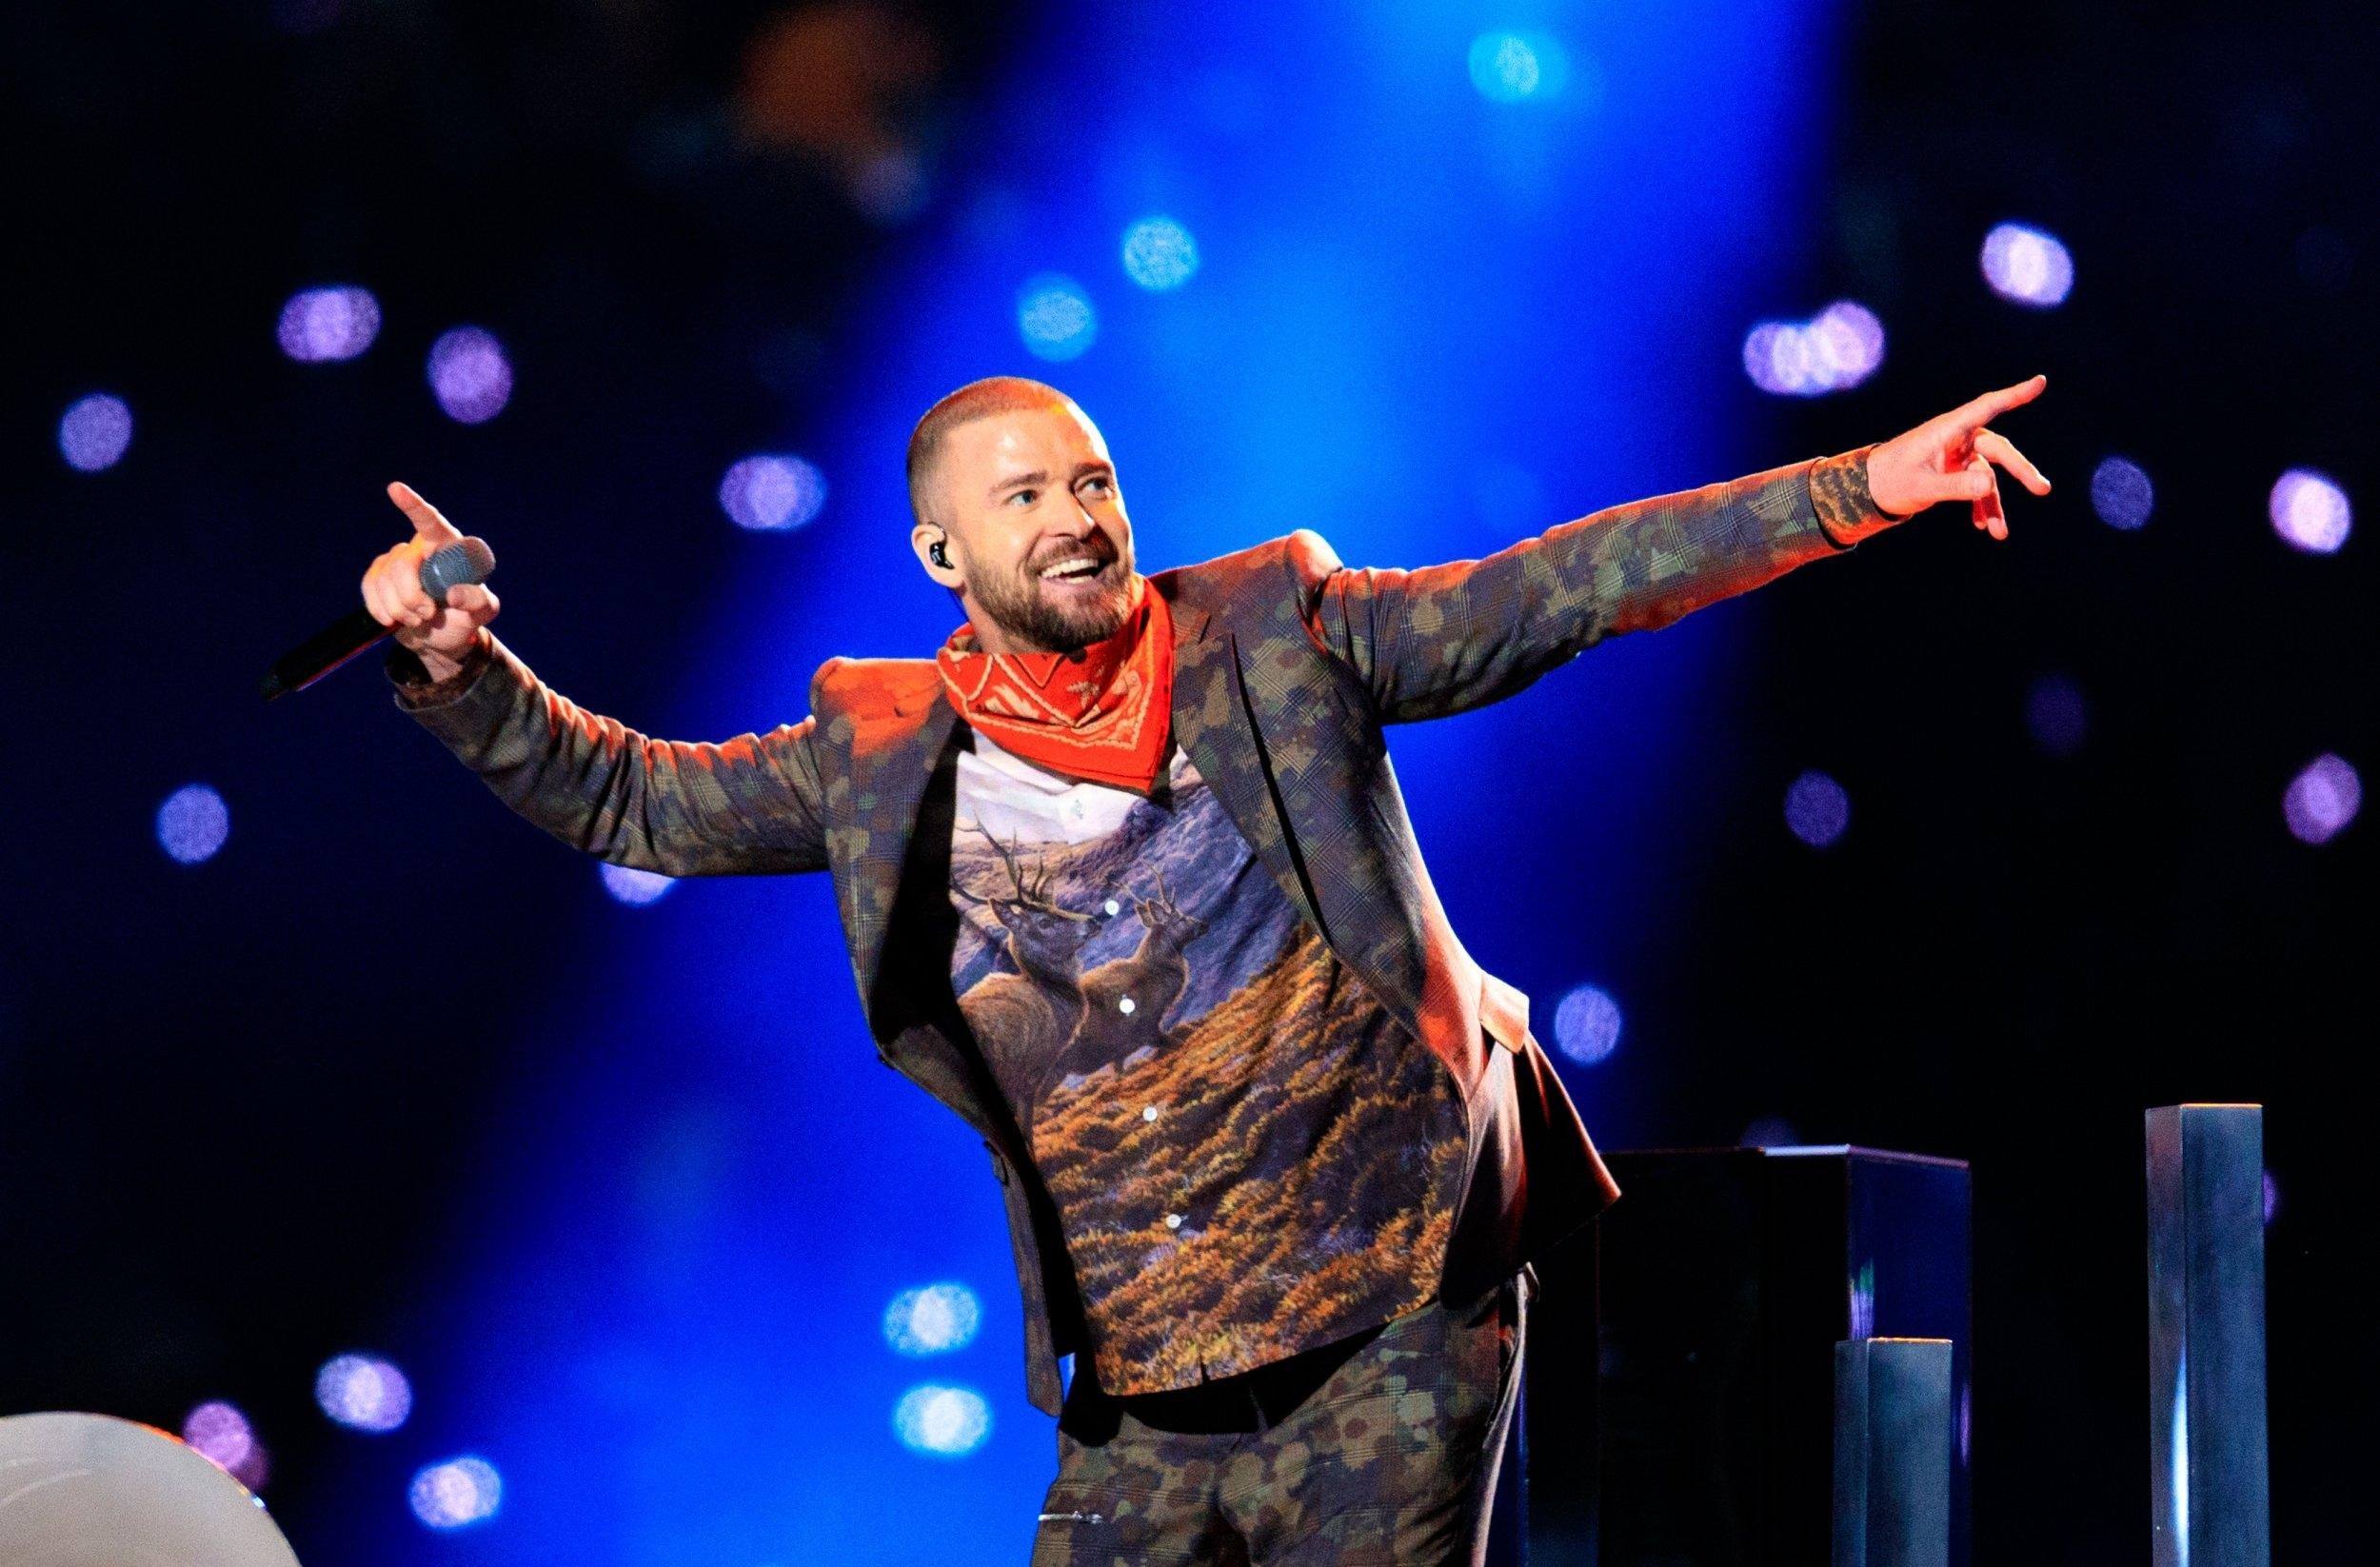 Watch Justin Timberlake's Full Super Bowl Halftime Show for Justin Timberlake Super Bowl 2018